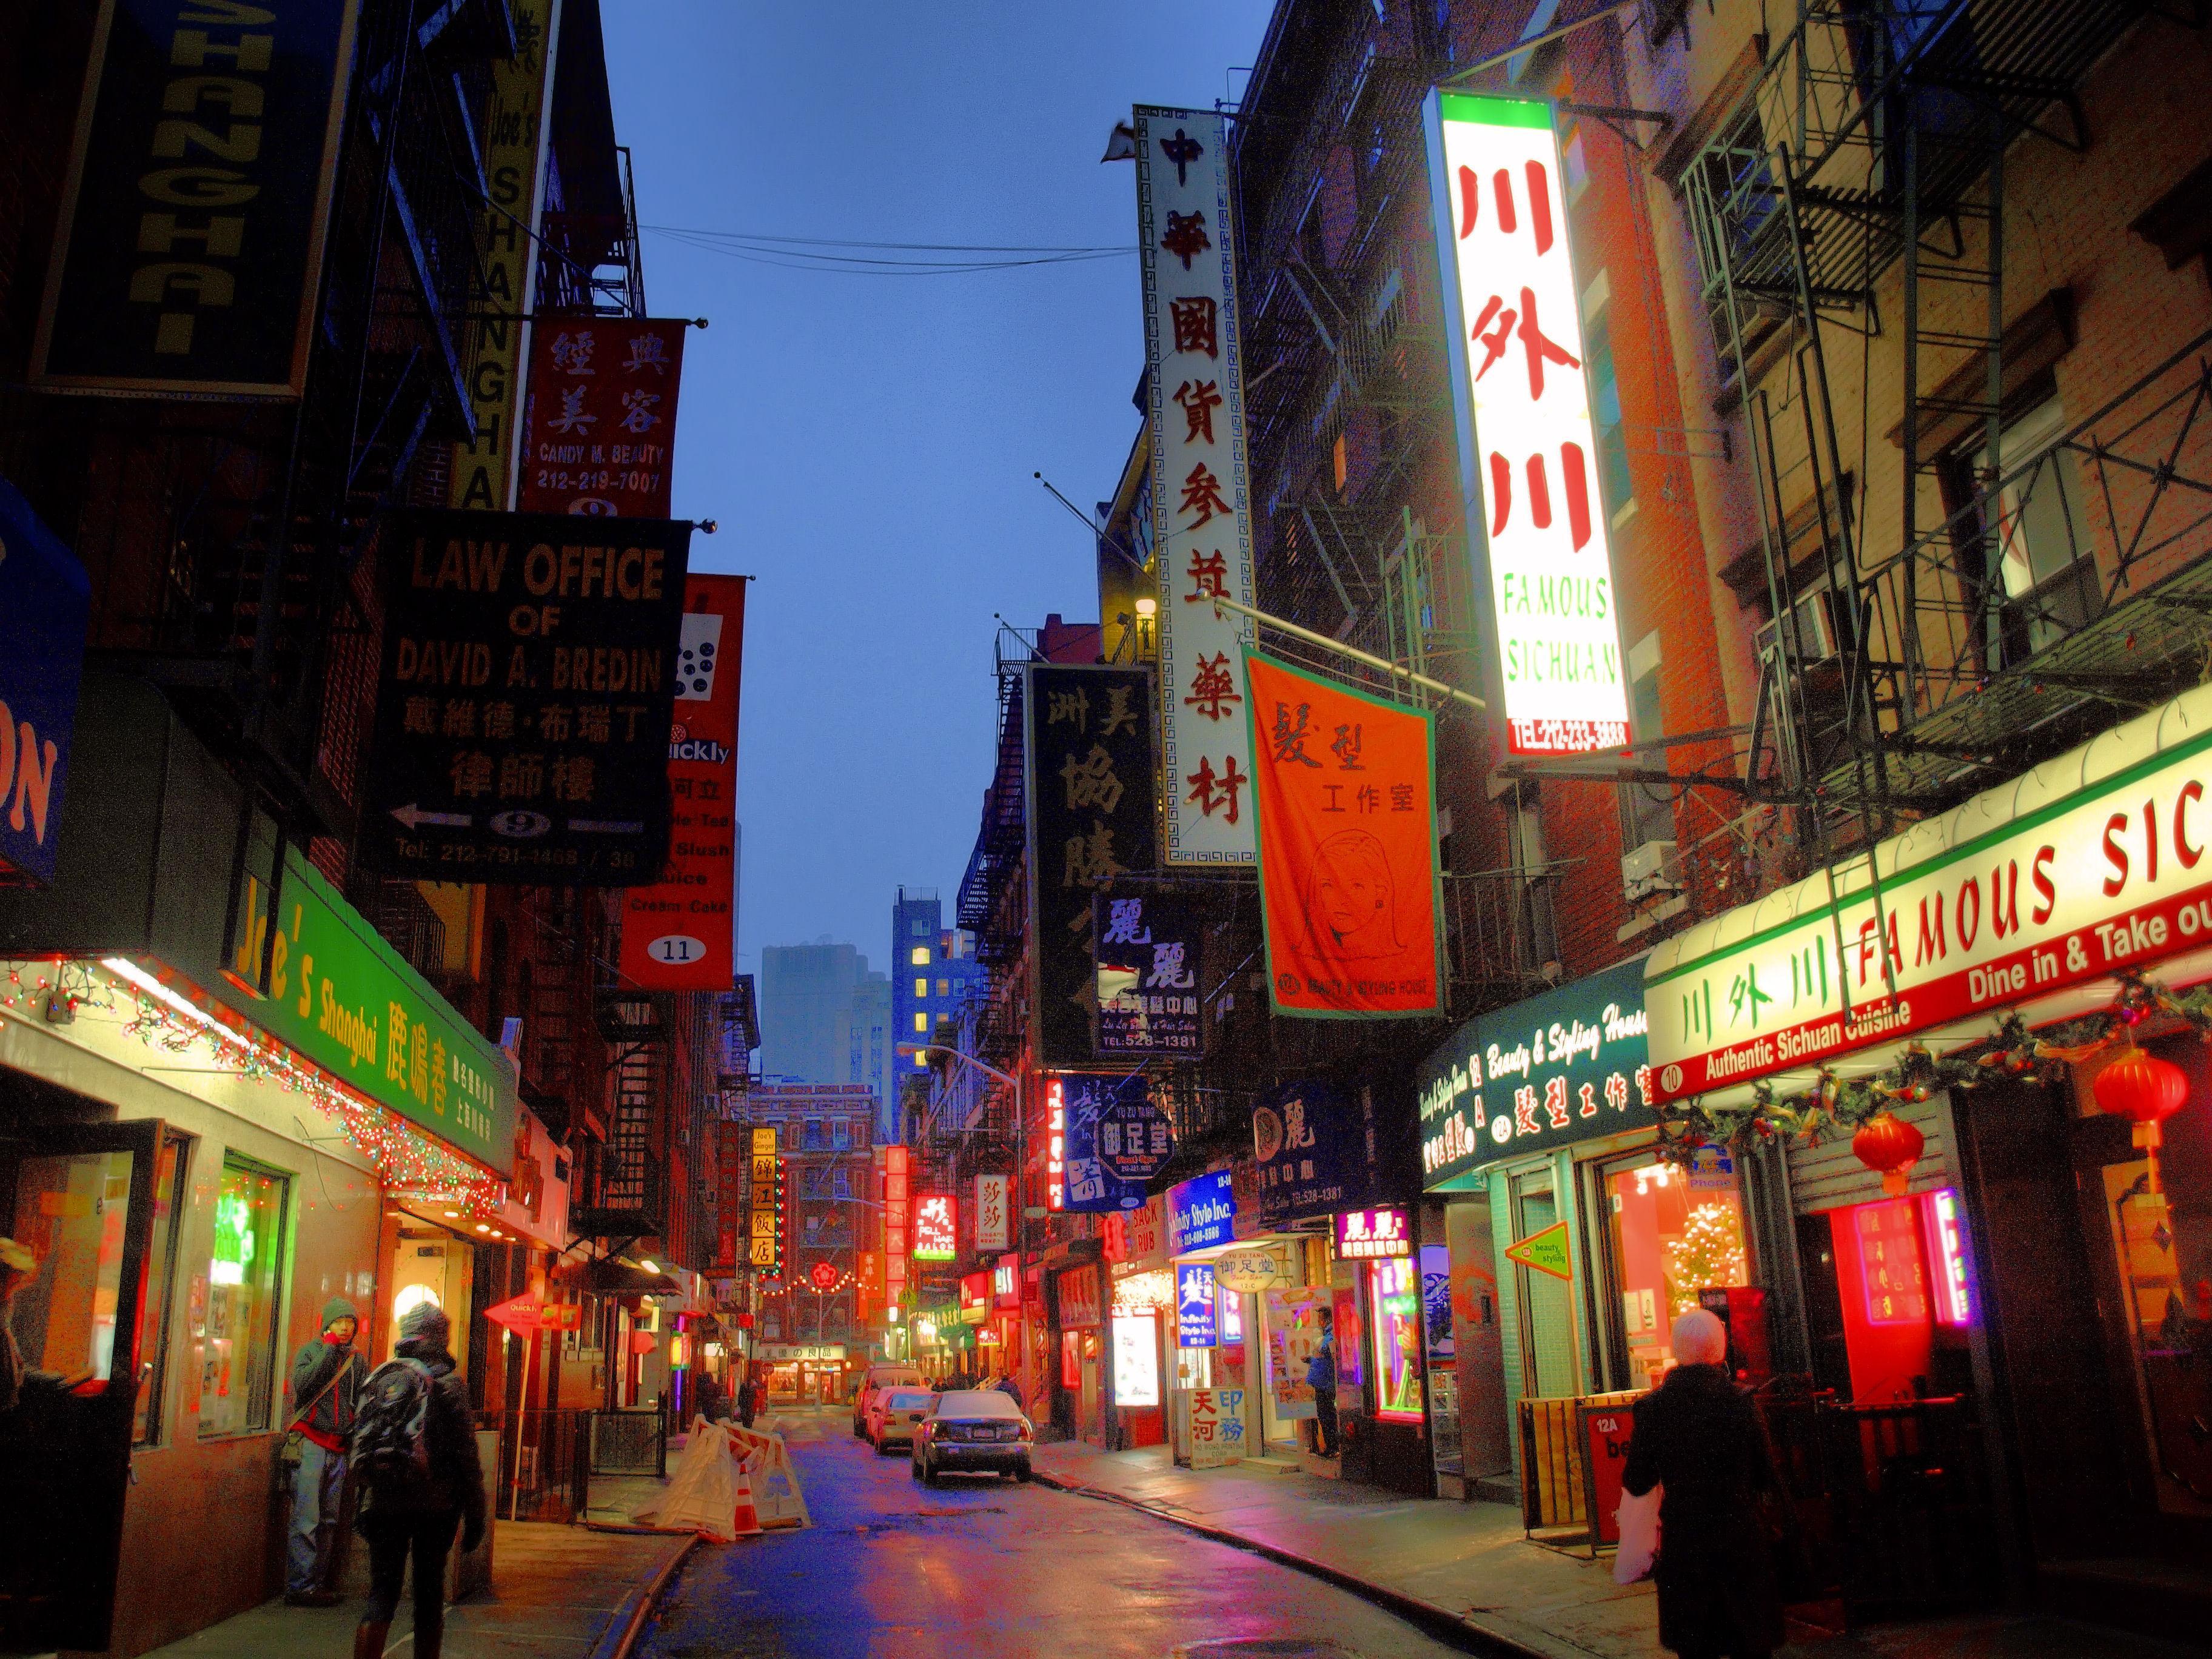 Обои ночь, движение, manhatten, чайнатаун, улица, здание, манхеттен. Города foto 15